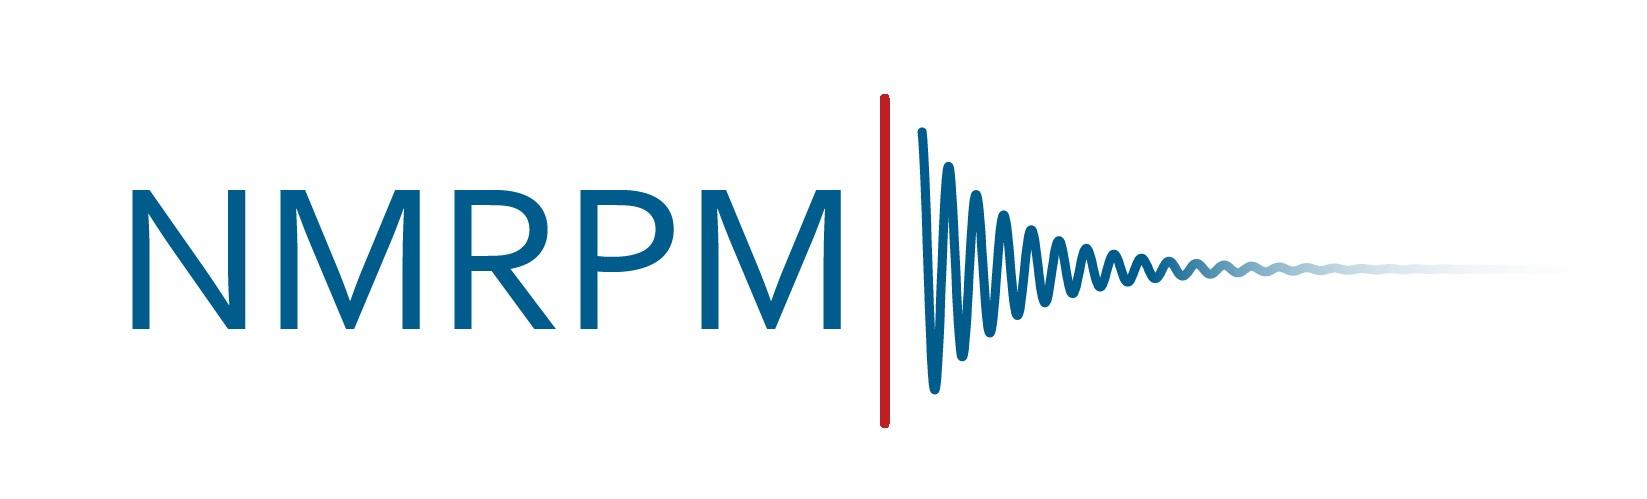 NMRPM logo